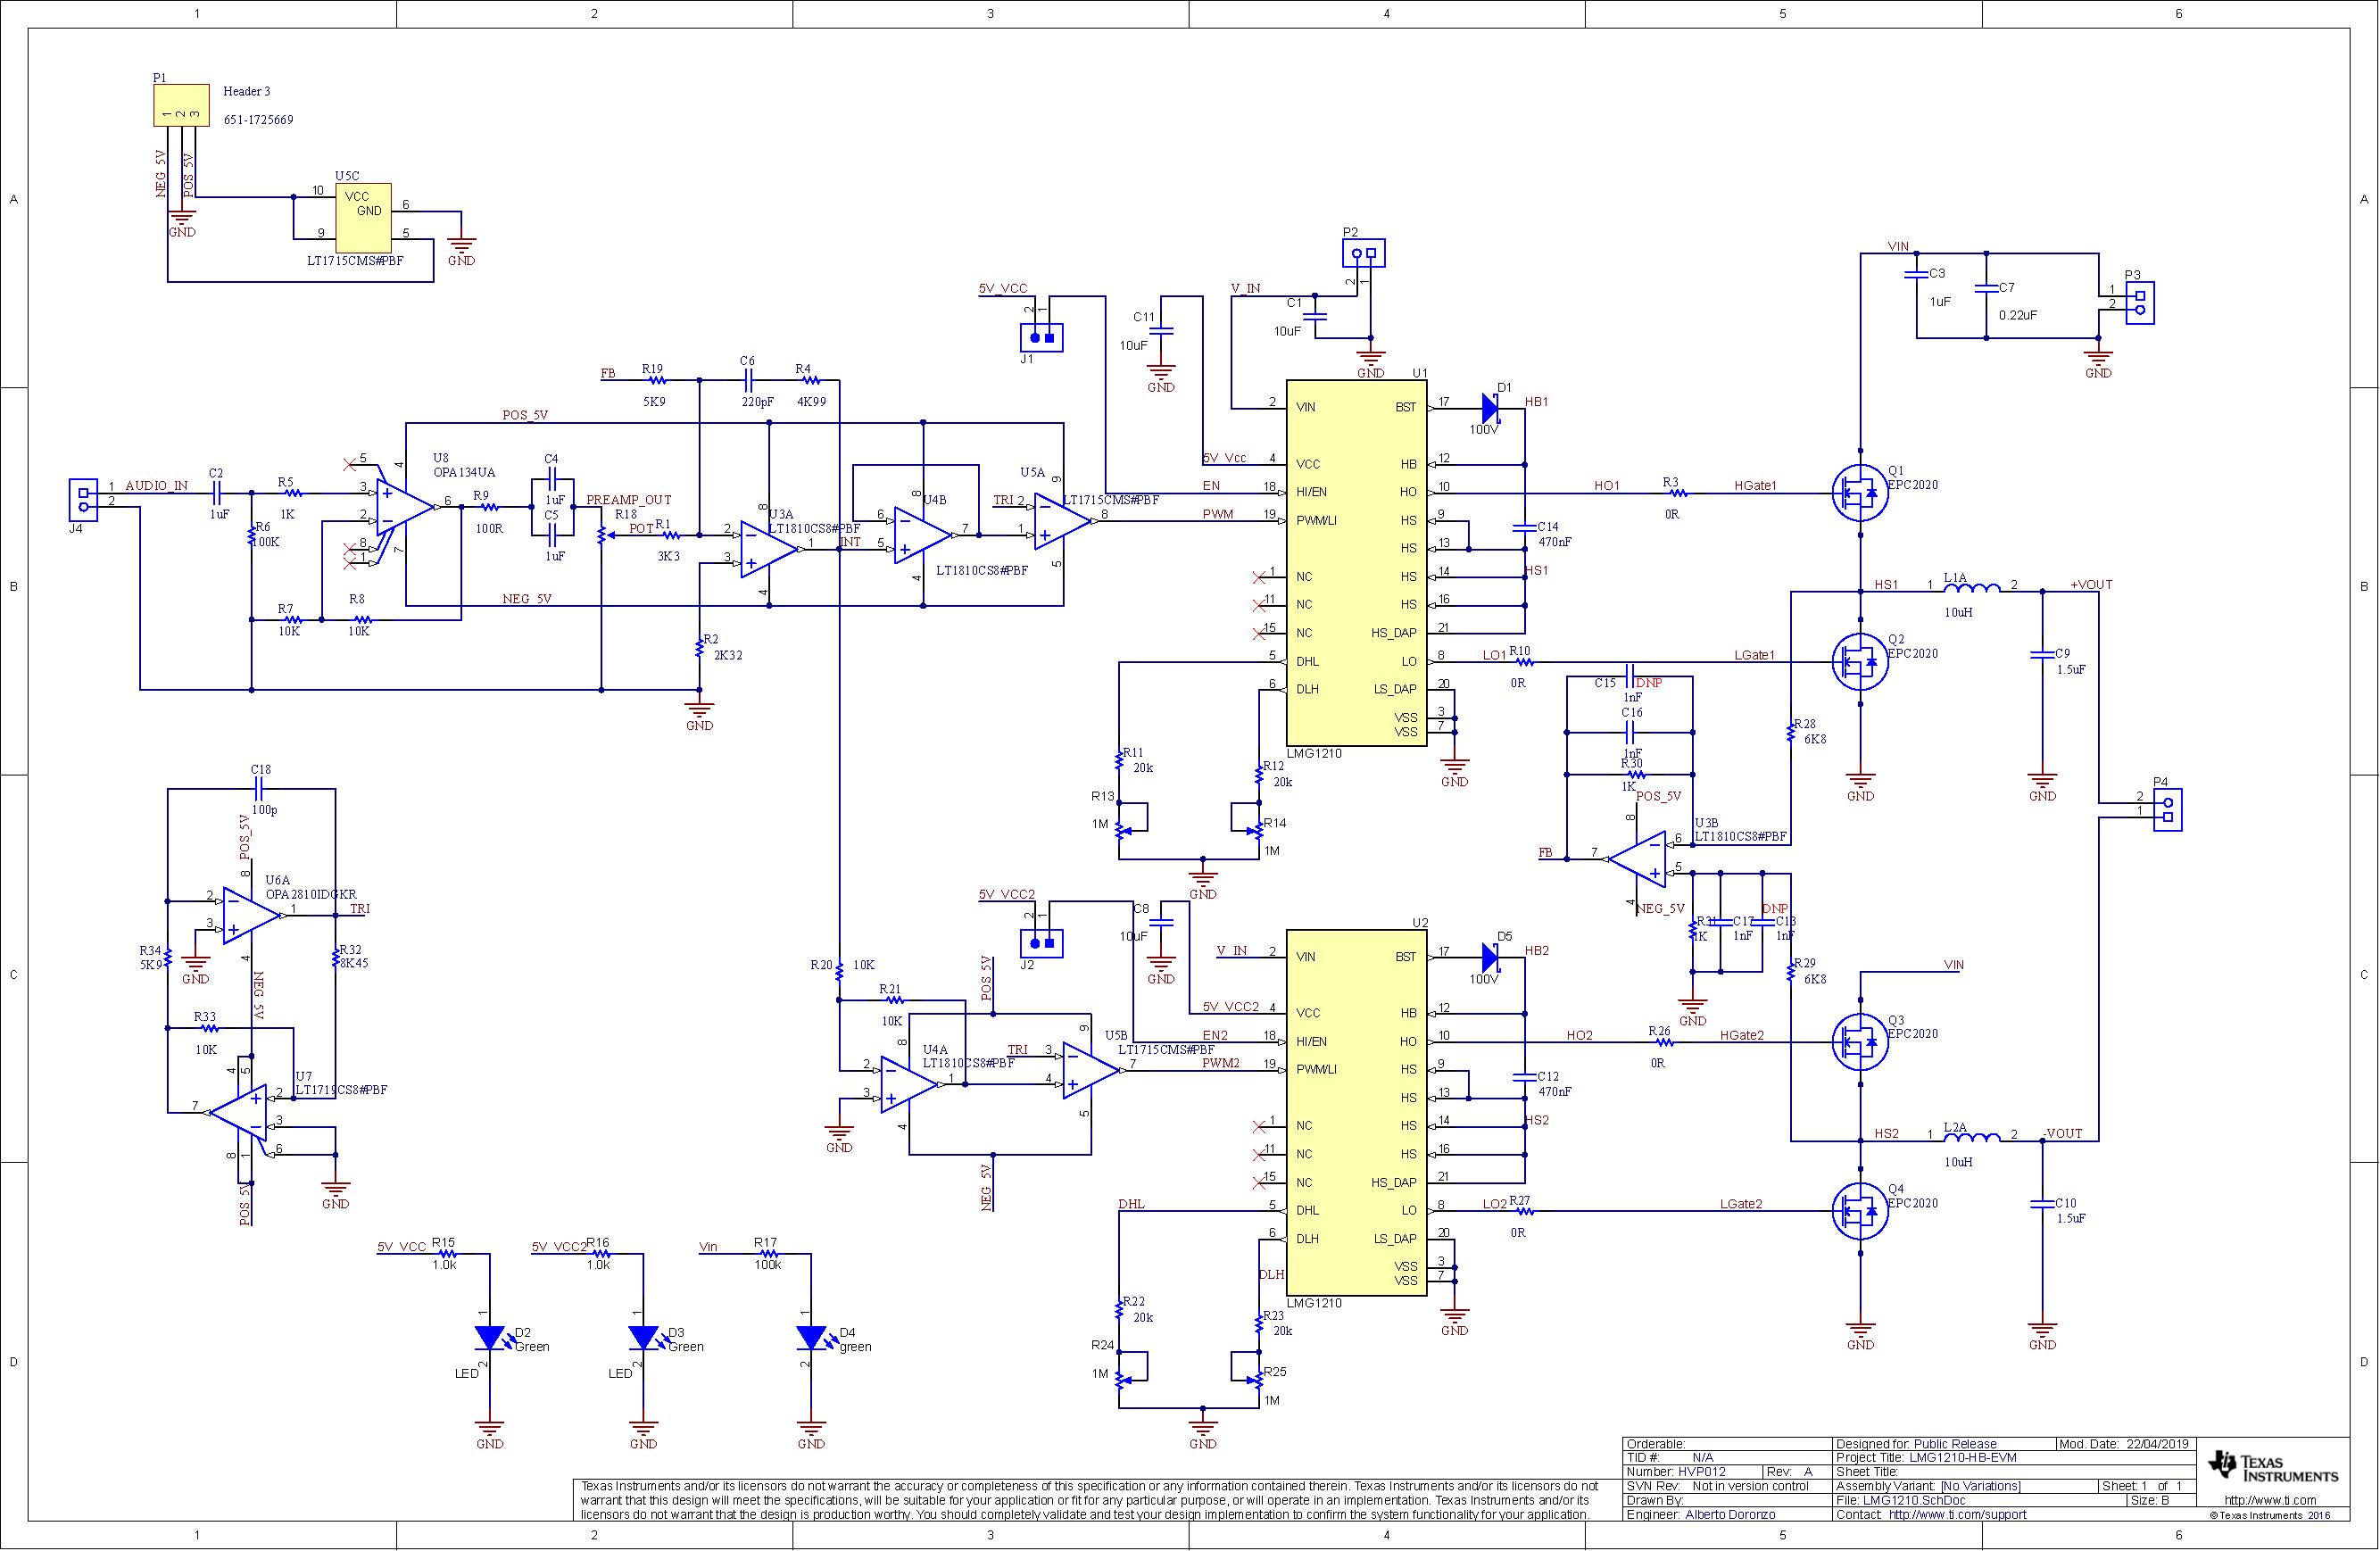 LMG1210: PCB Layout & TI Vault connection - Power management